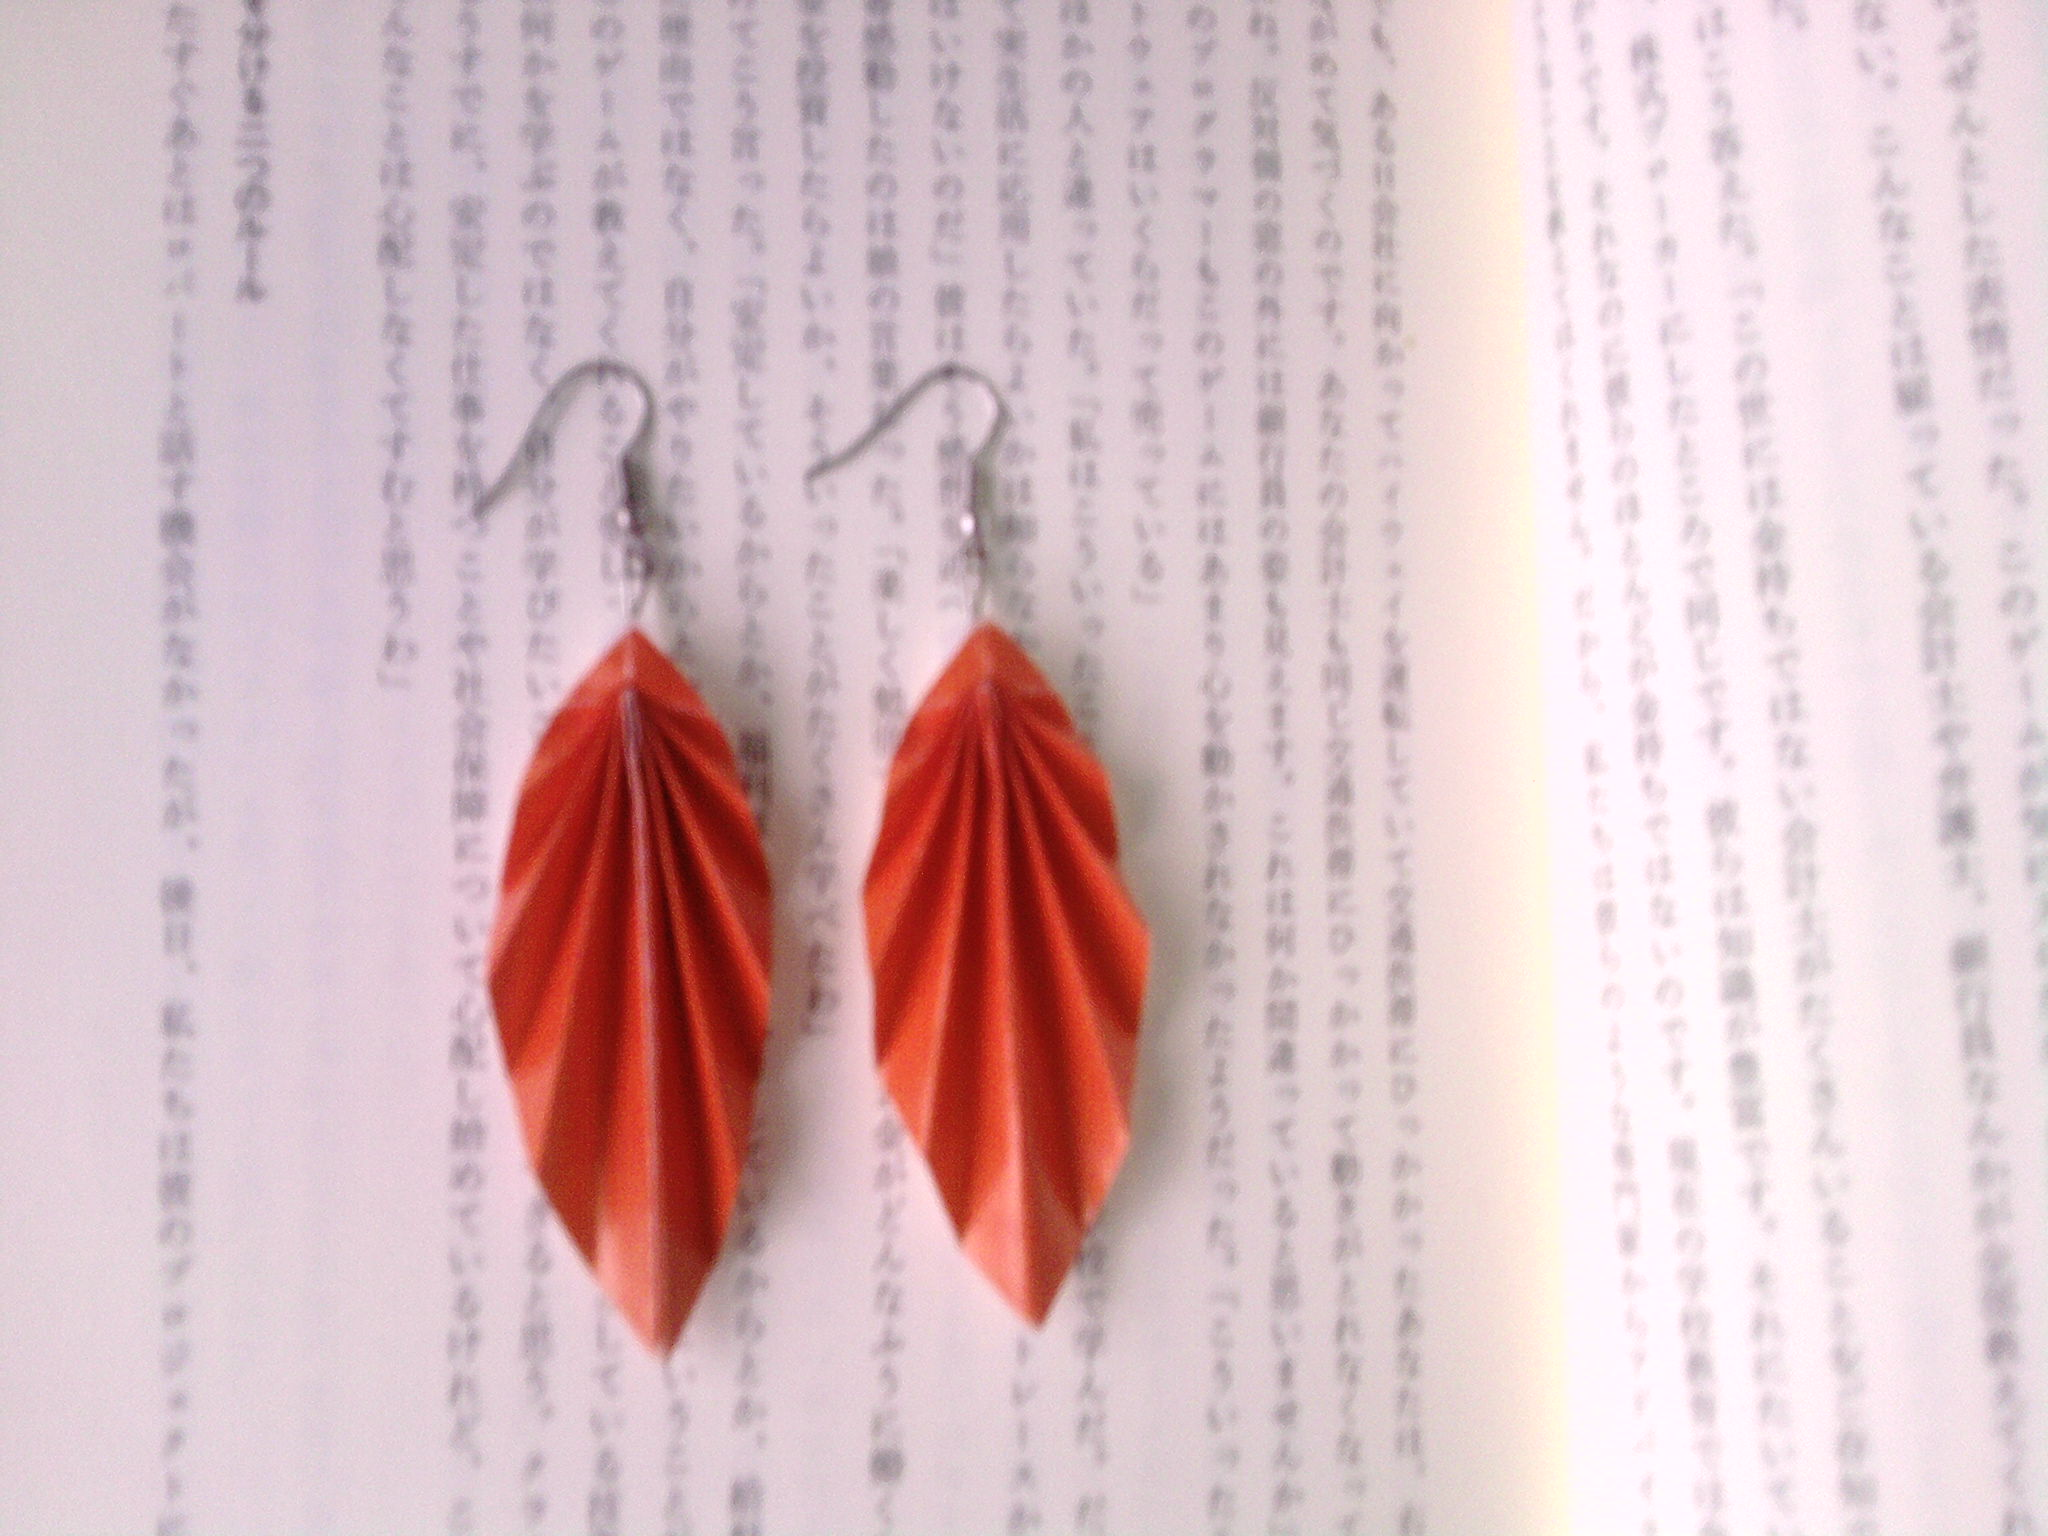 How to make Japanese origami leaf earrings?